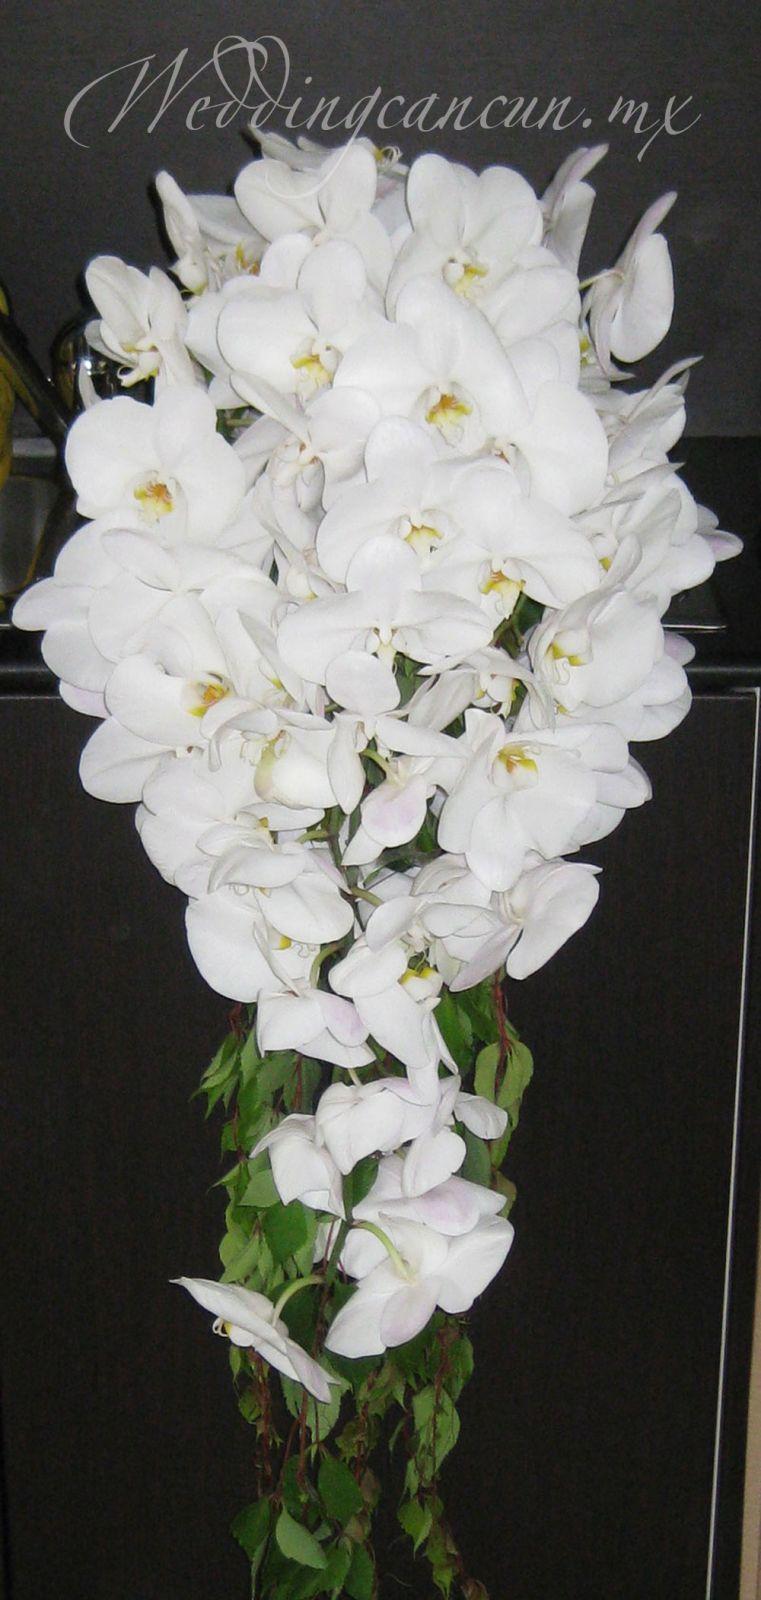 deluxe bridal bouquet. White phaleanopsis orchids